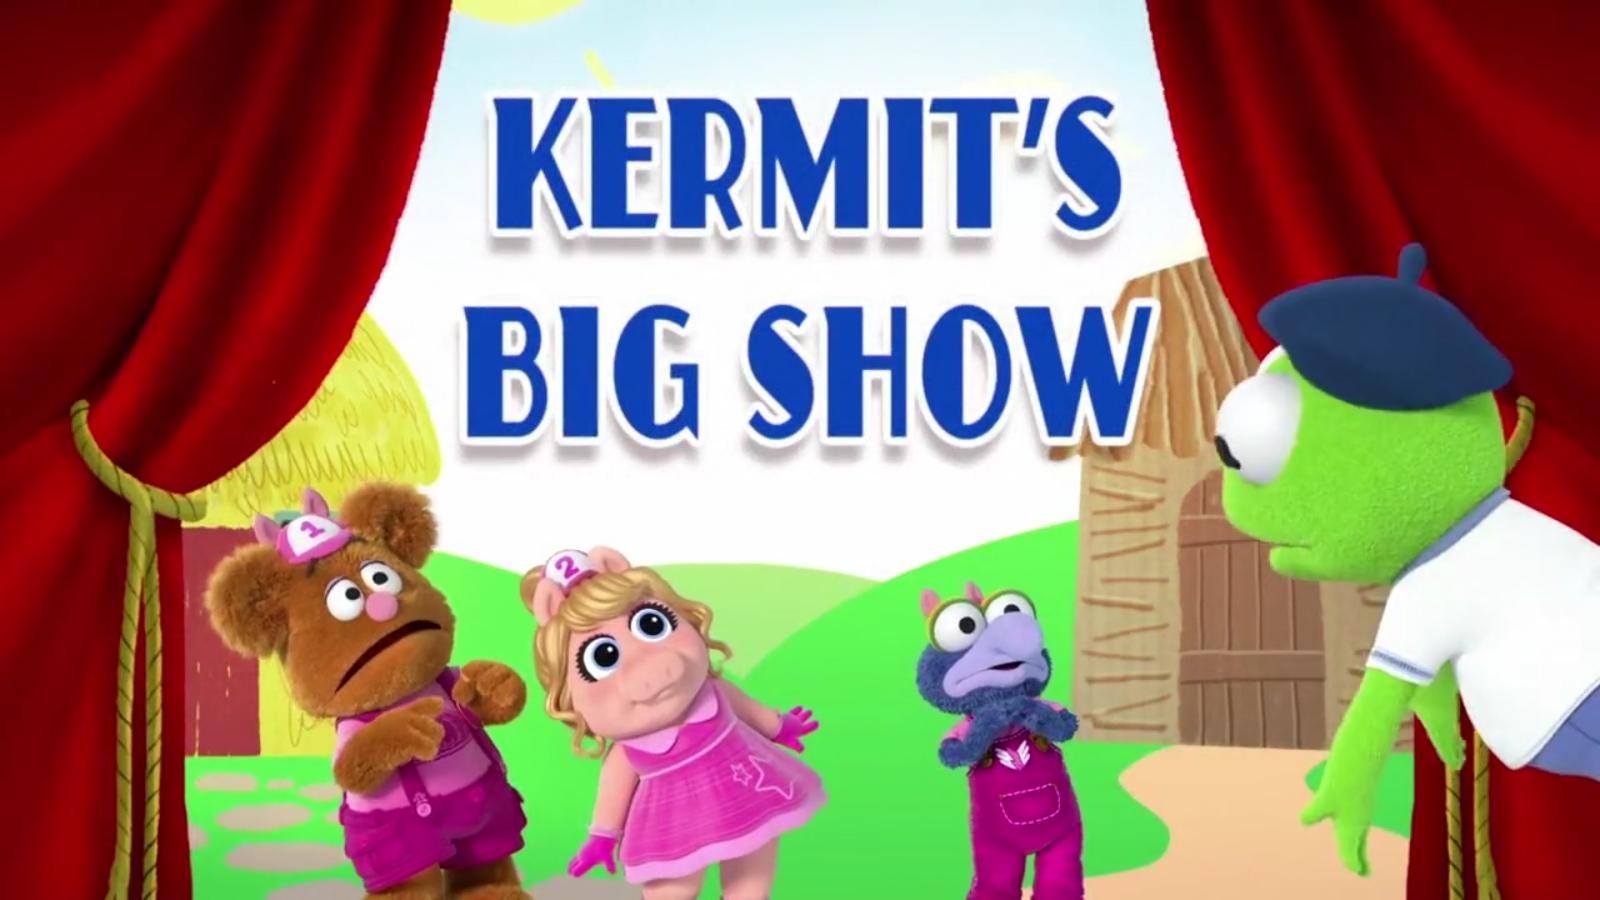 A Grande Peça do Kermit